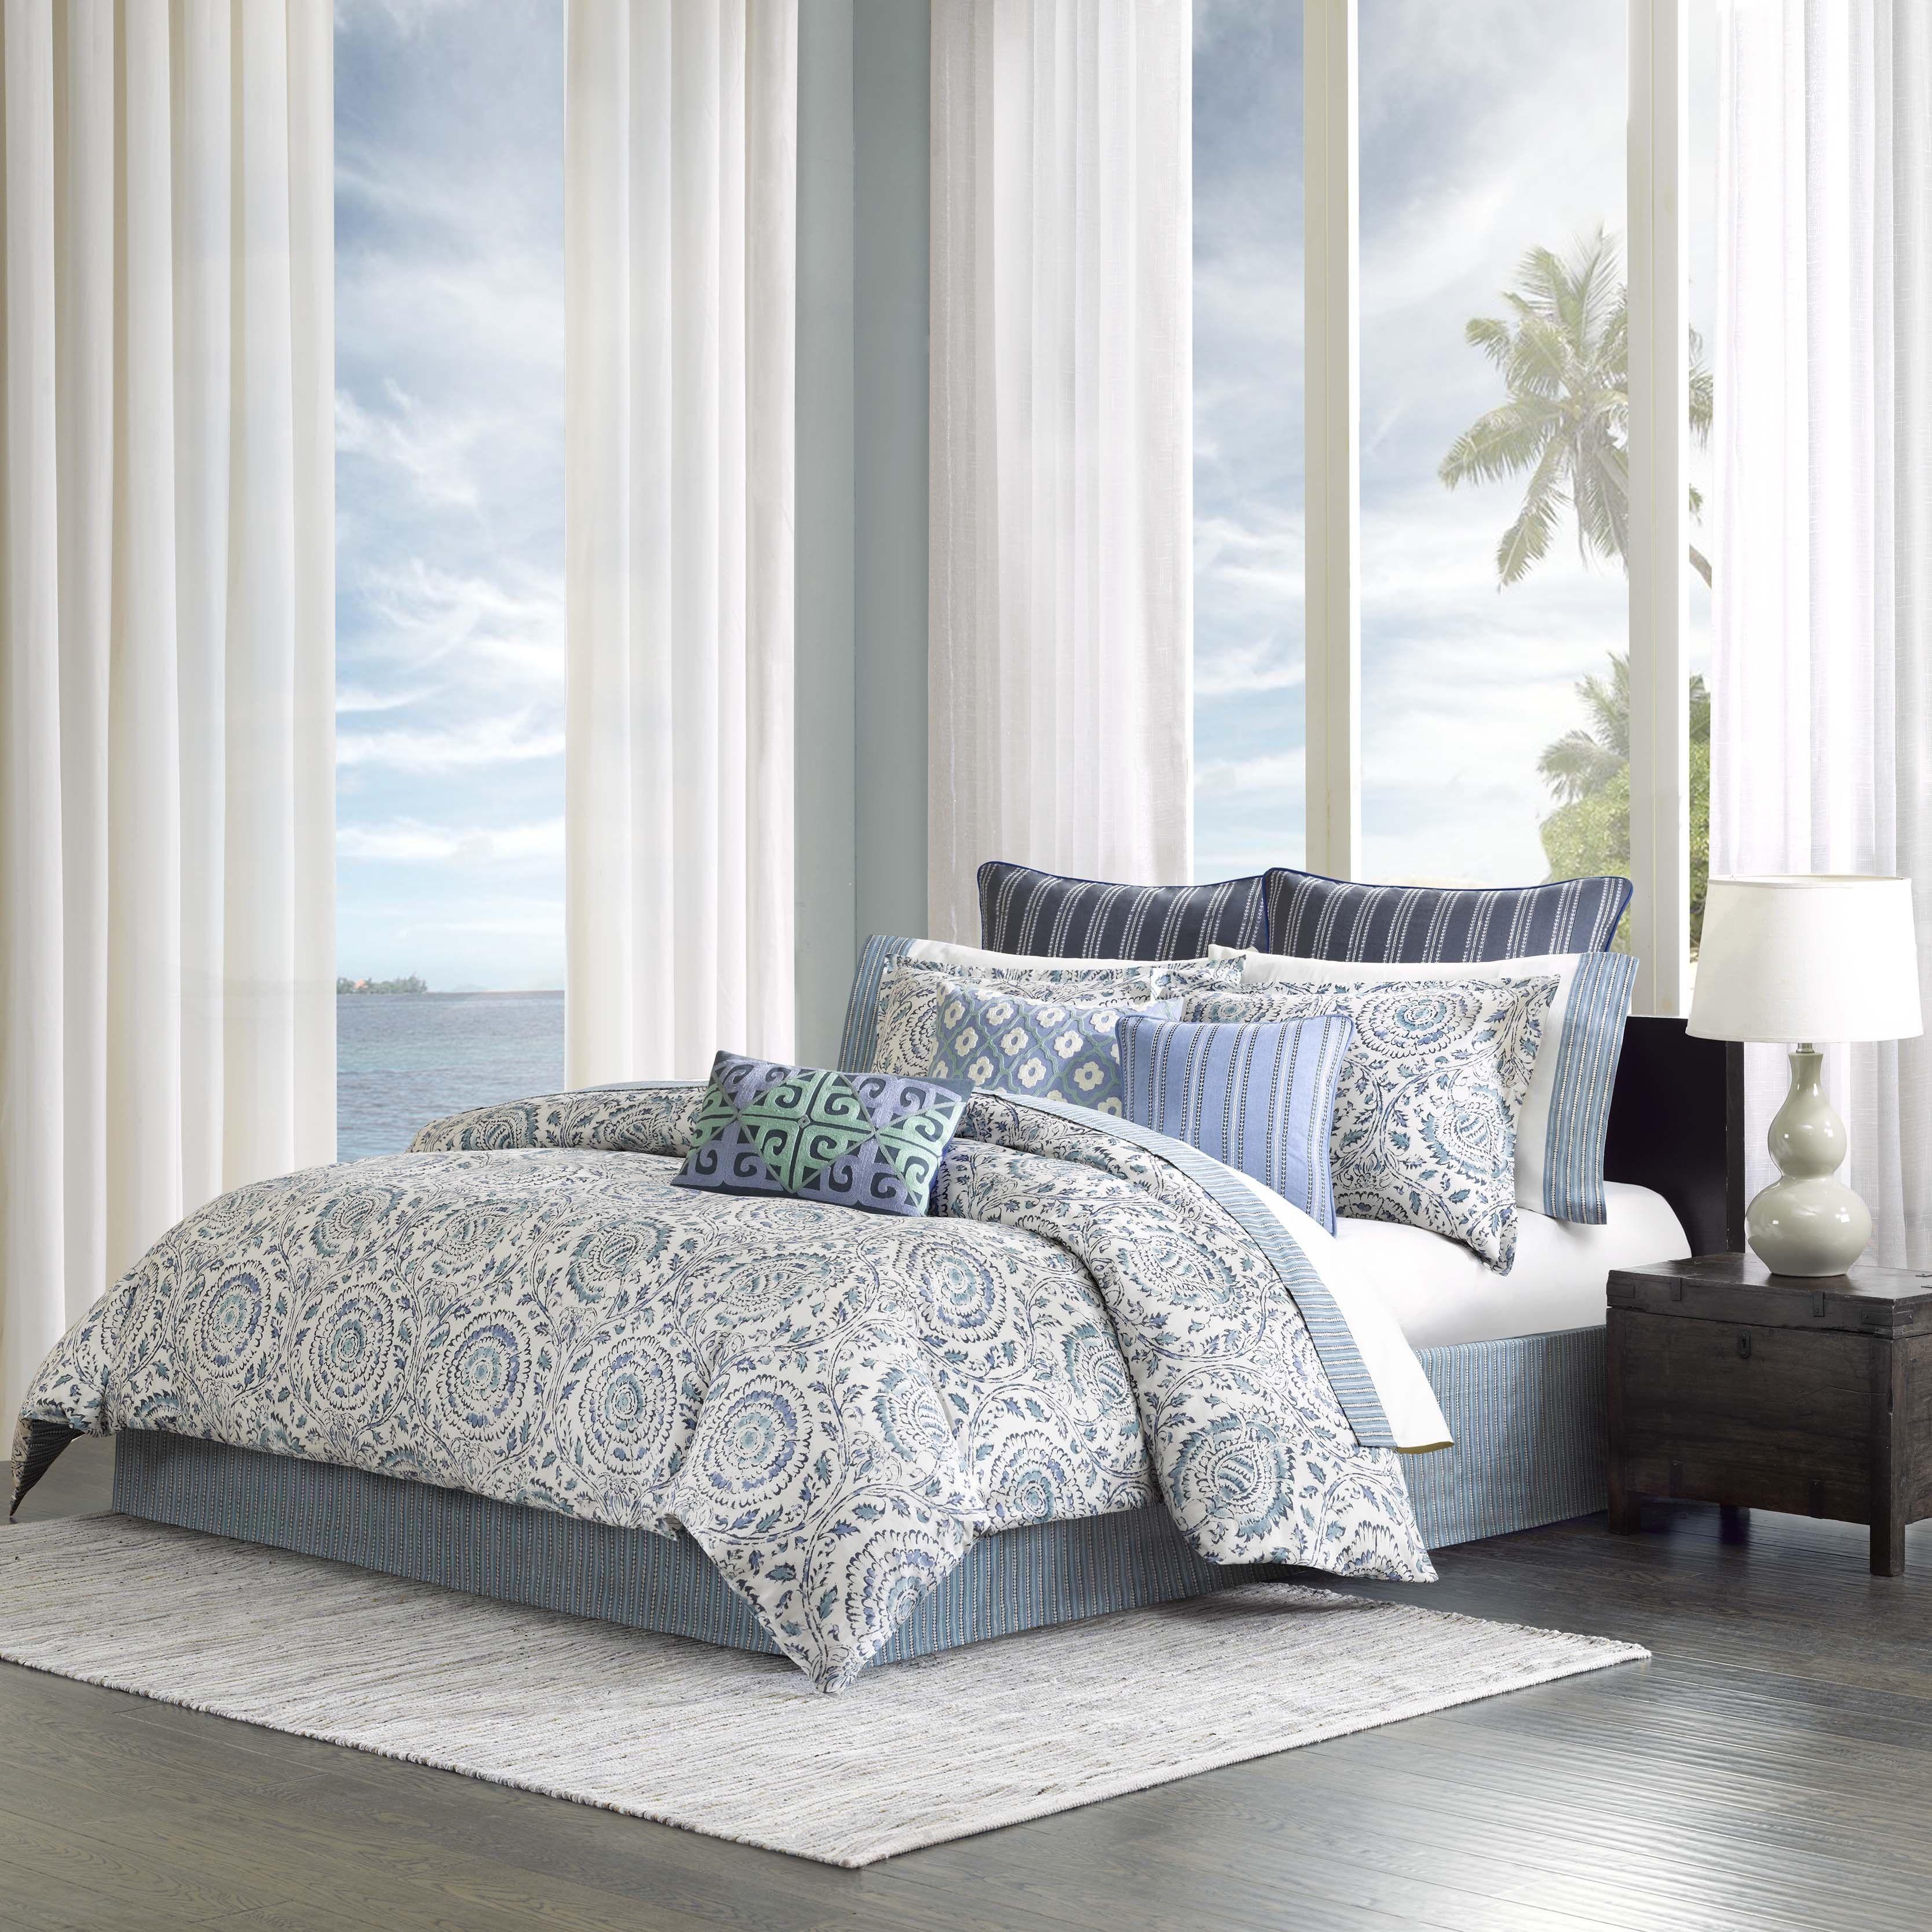 nautica flannel pleasant blue very king sets comforter ecrins lodge